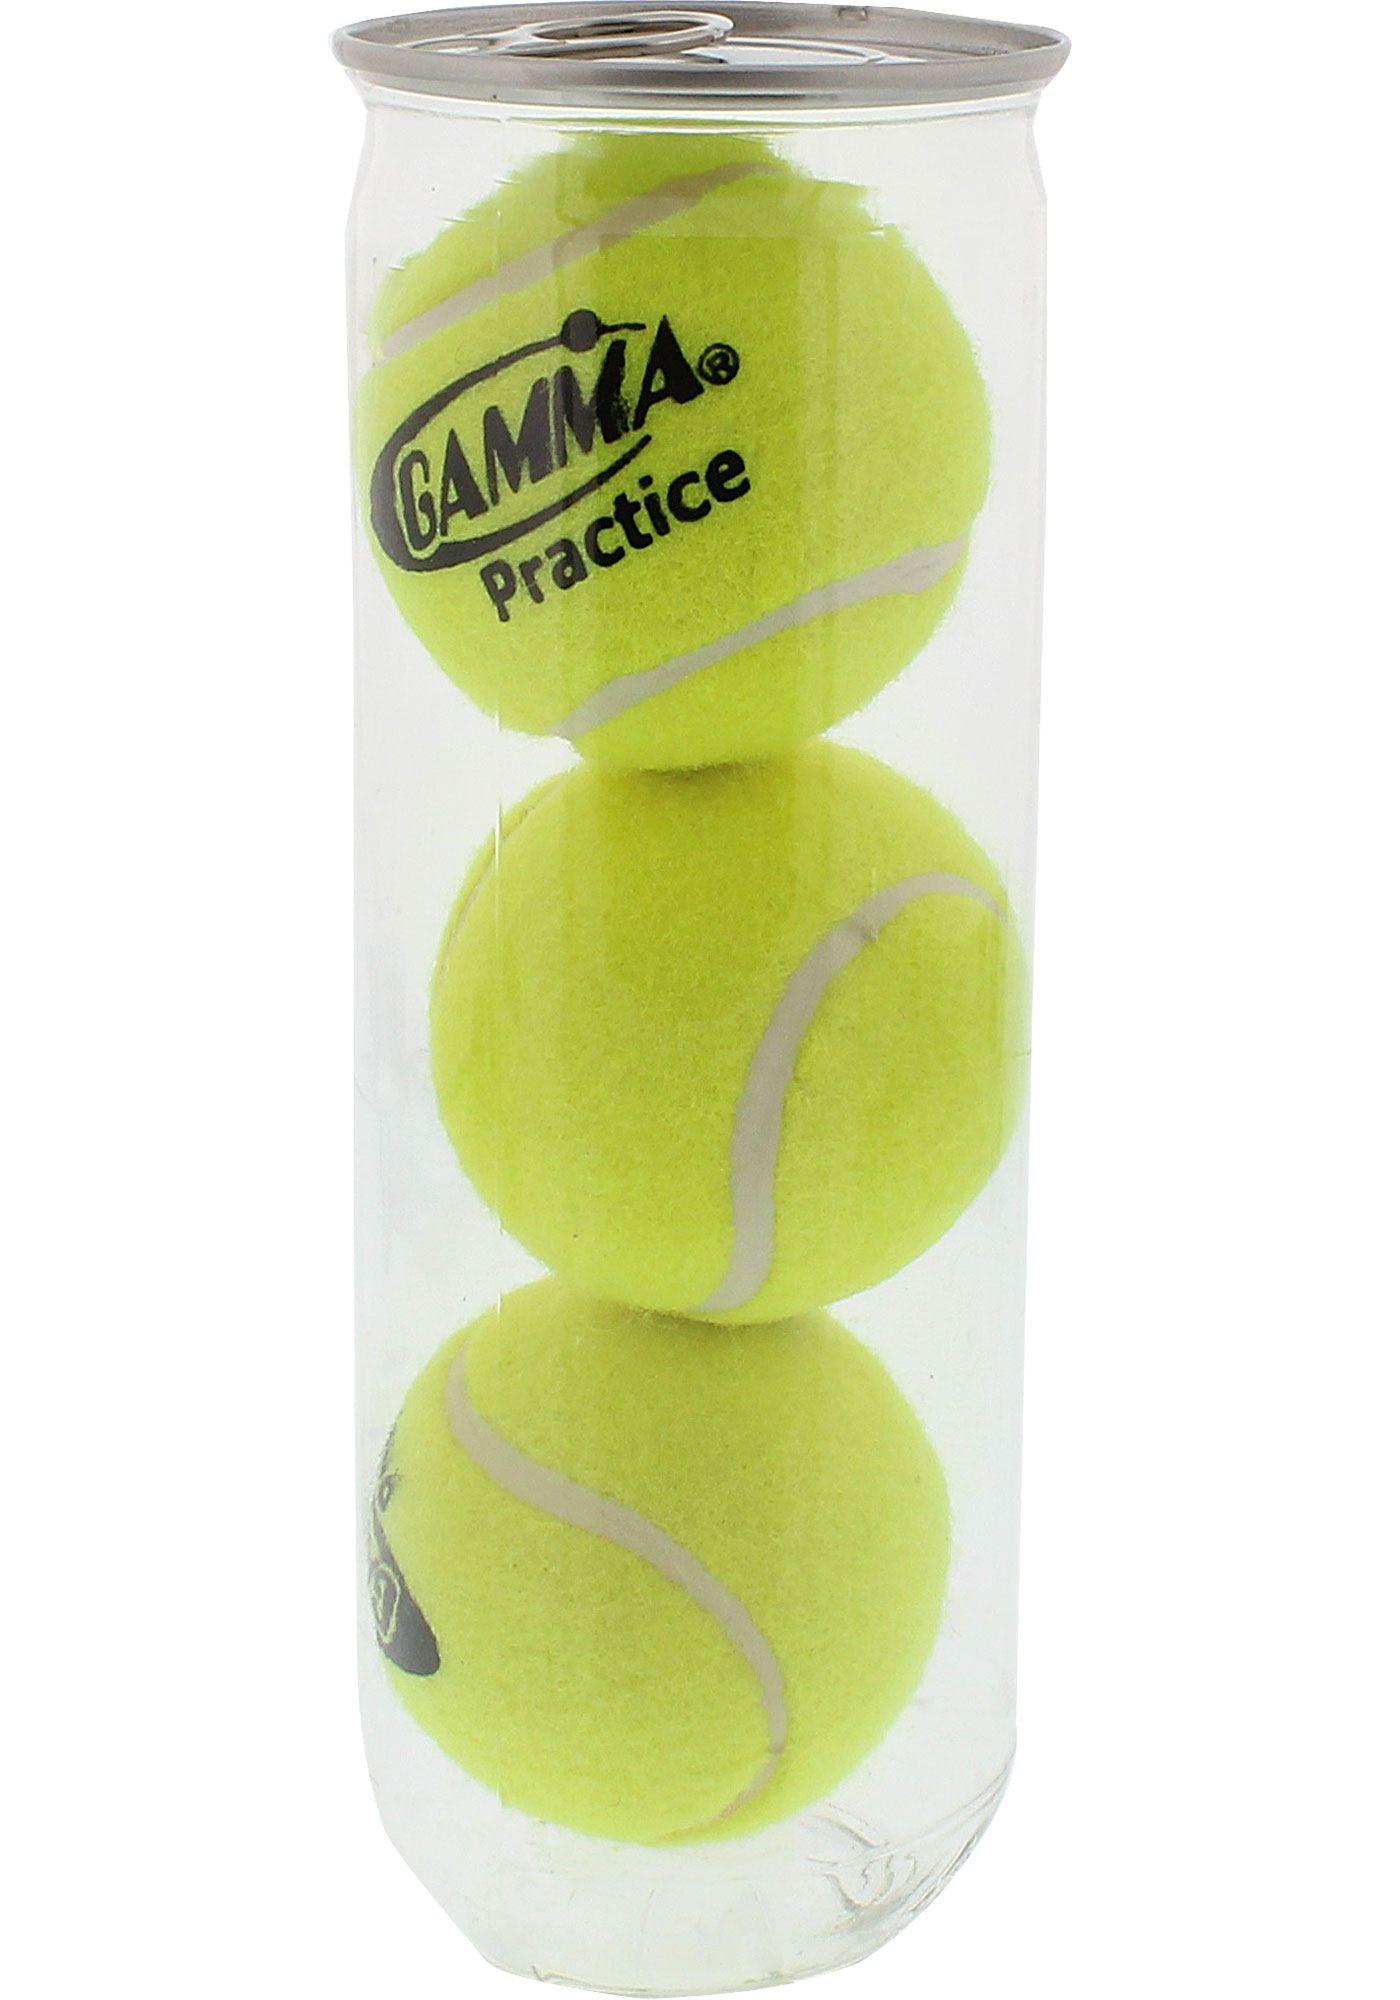 GAMMA Pro Practice Tennis Balls – 3 Can